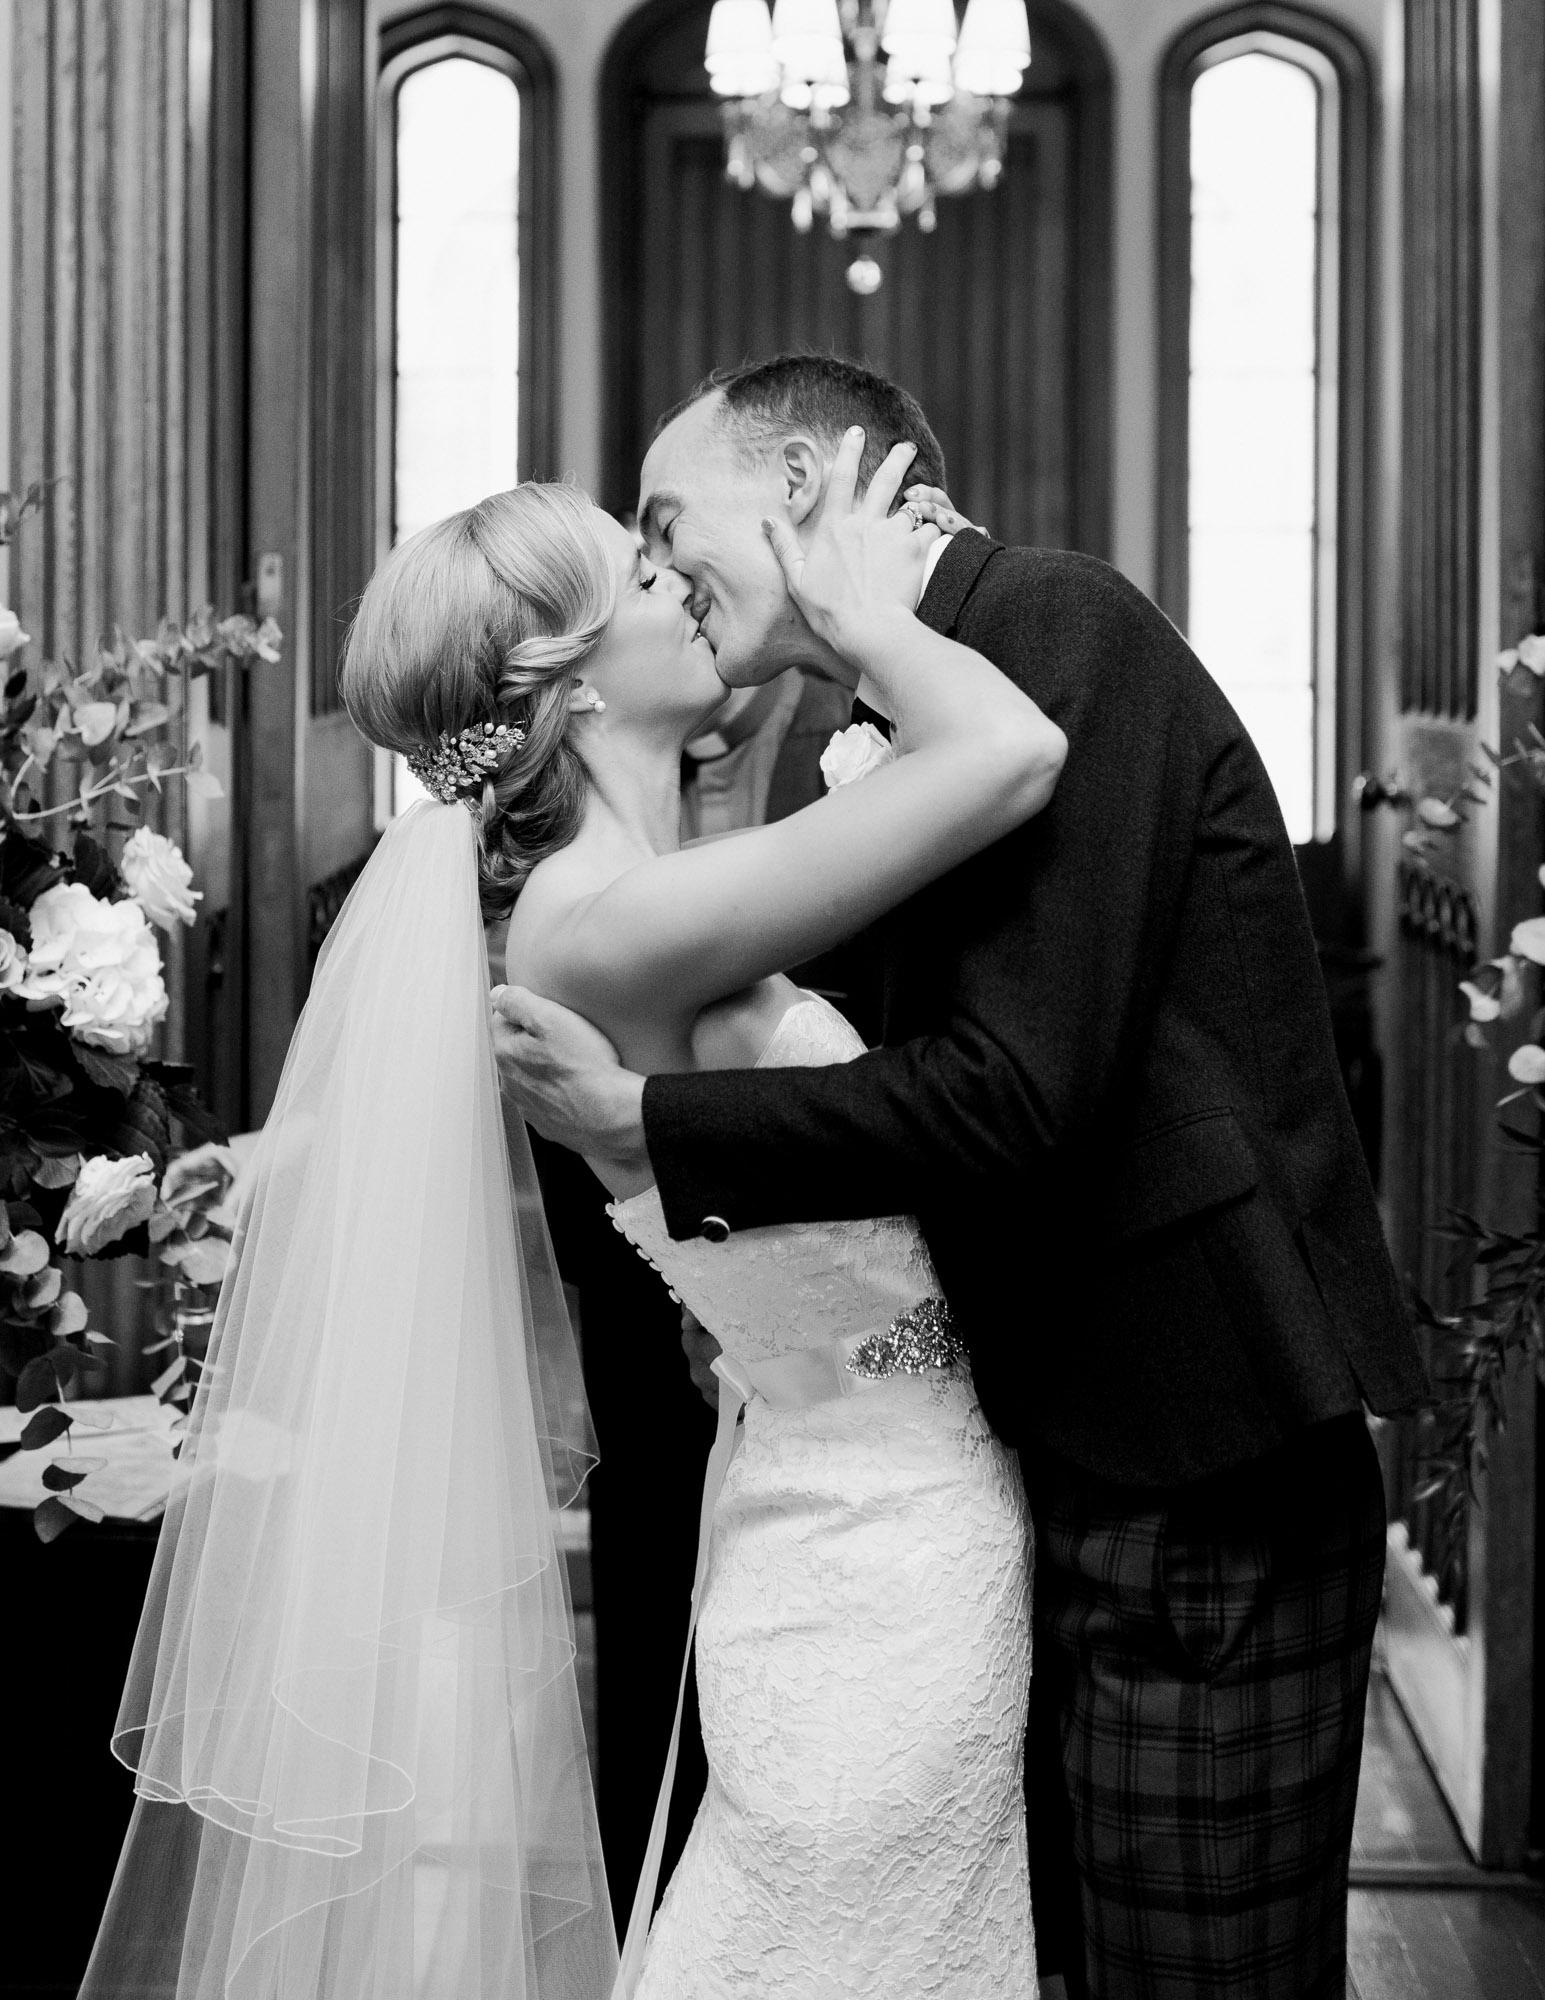 scottish_wedding_blairquhan_castle-66.jpg